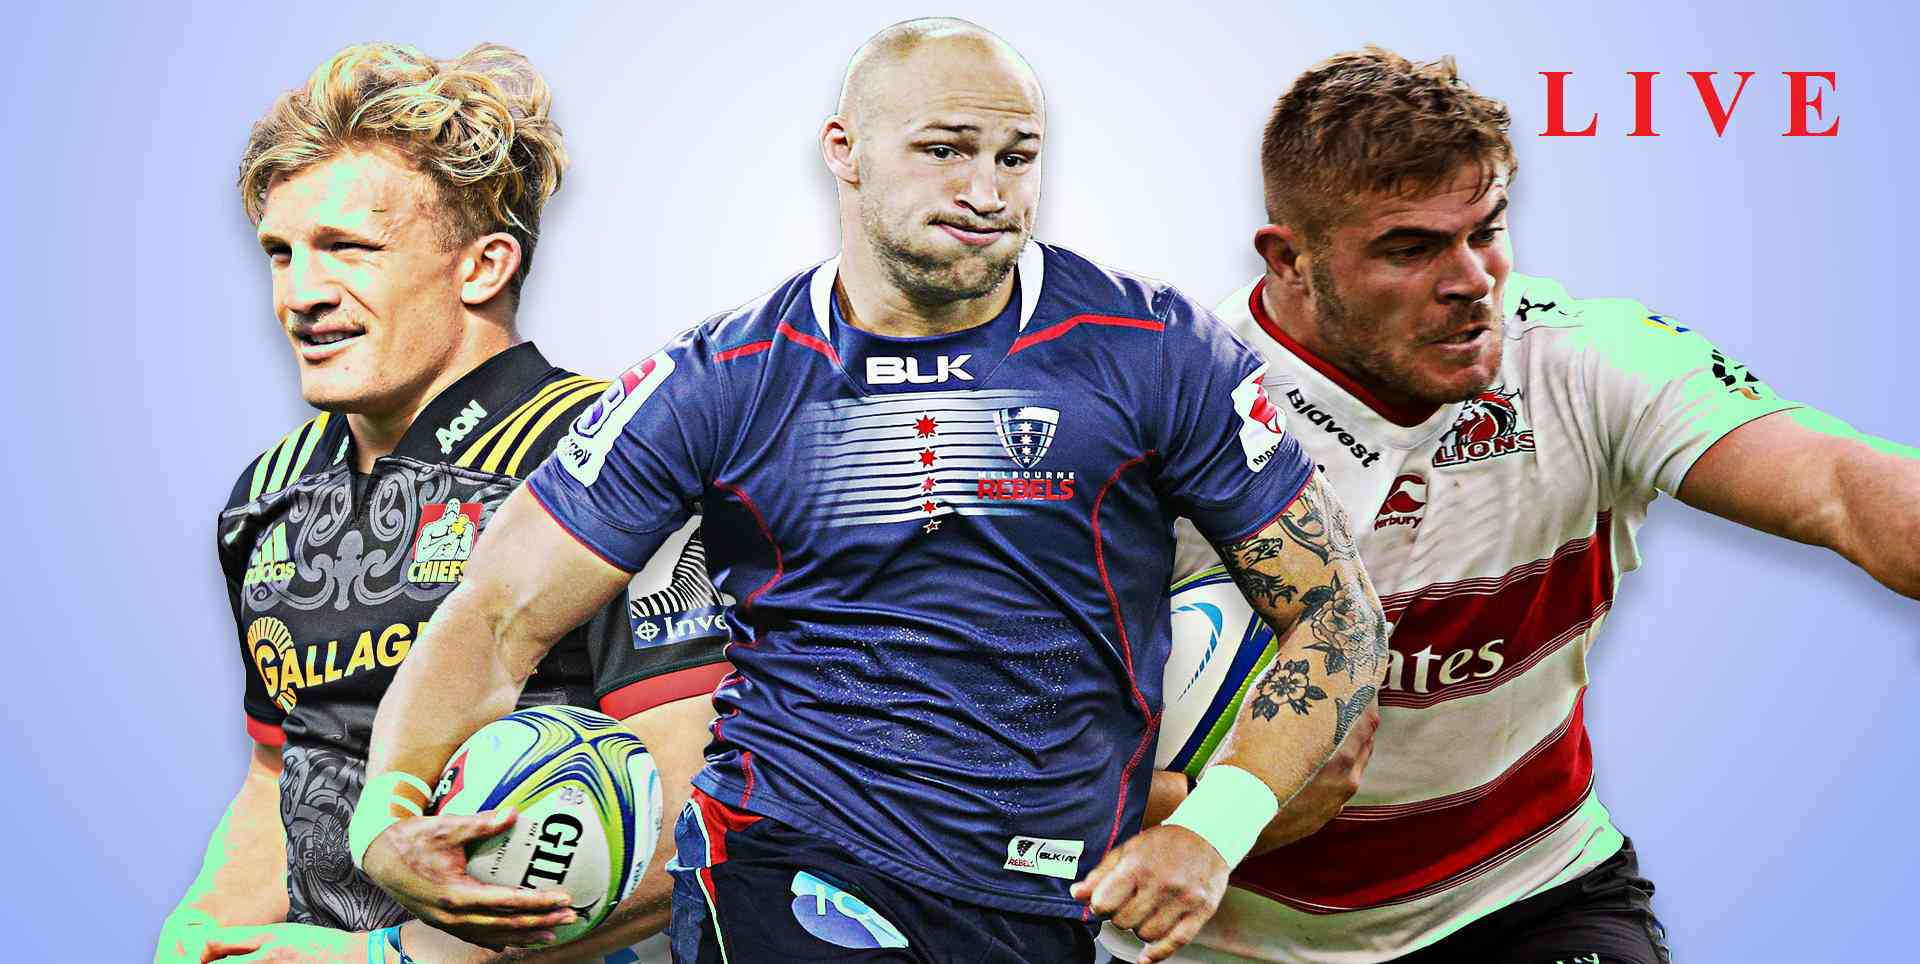 Watch Cheetahs Vs Bulls Super Rugby Live